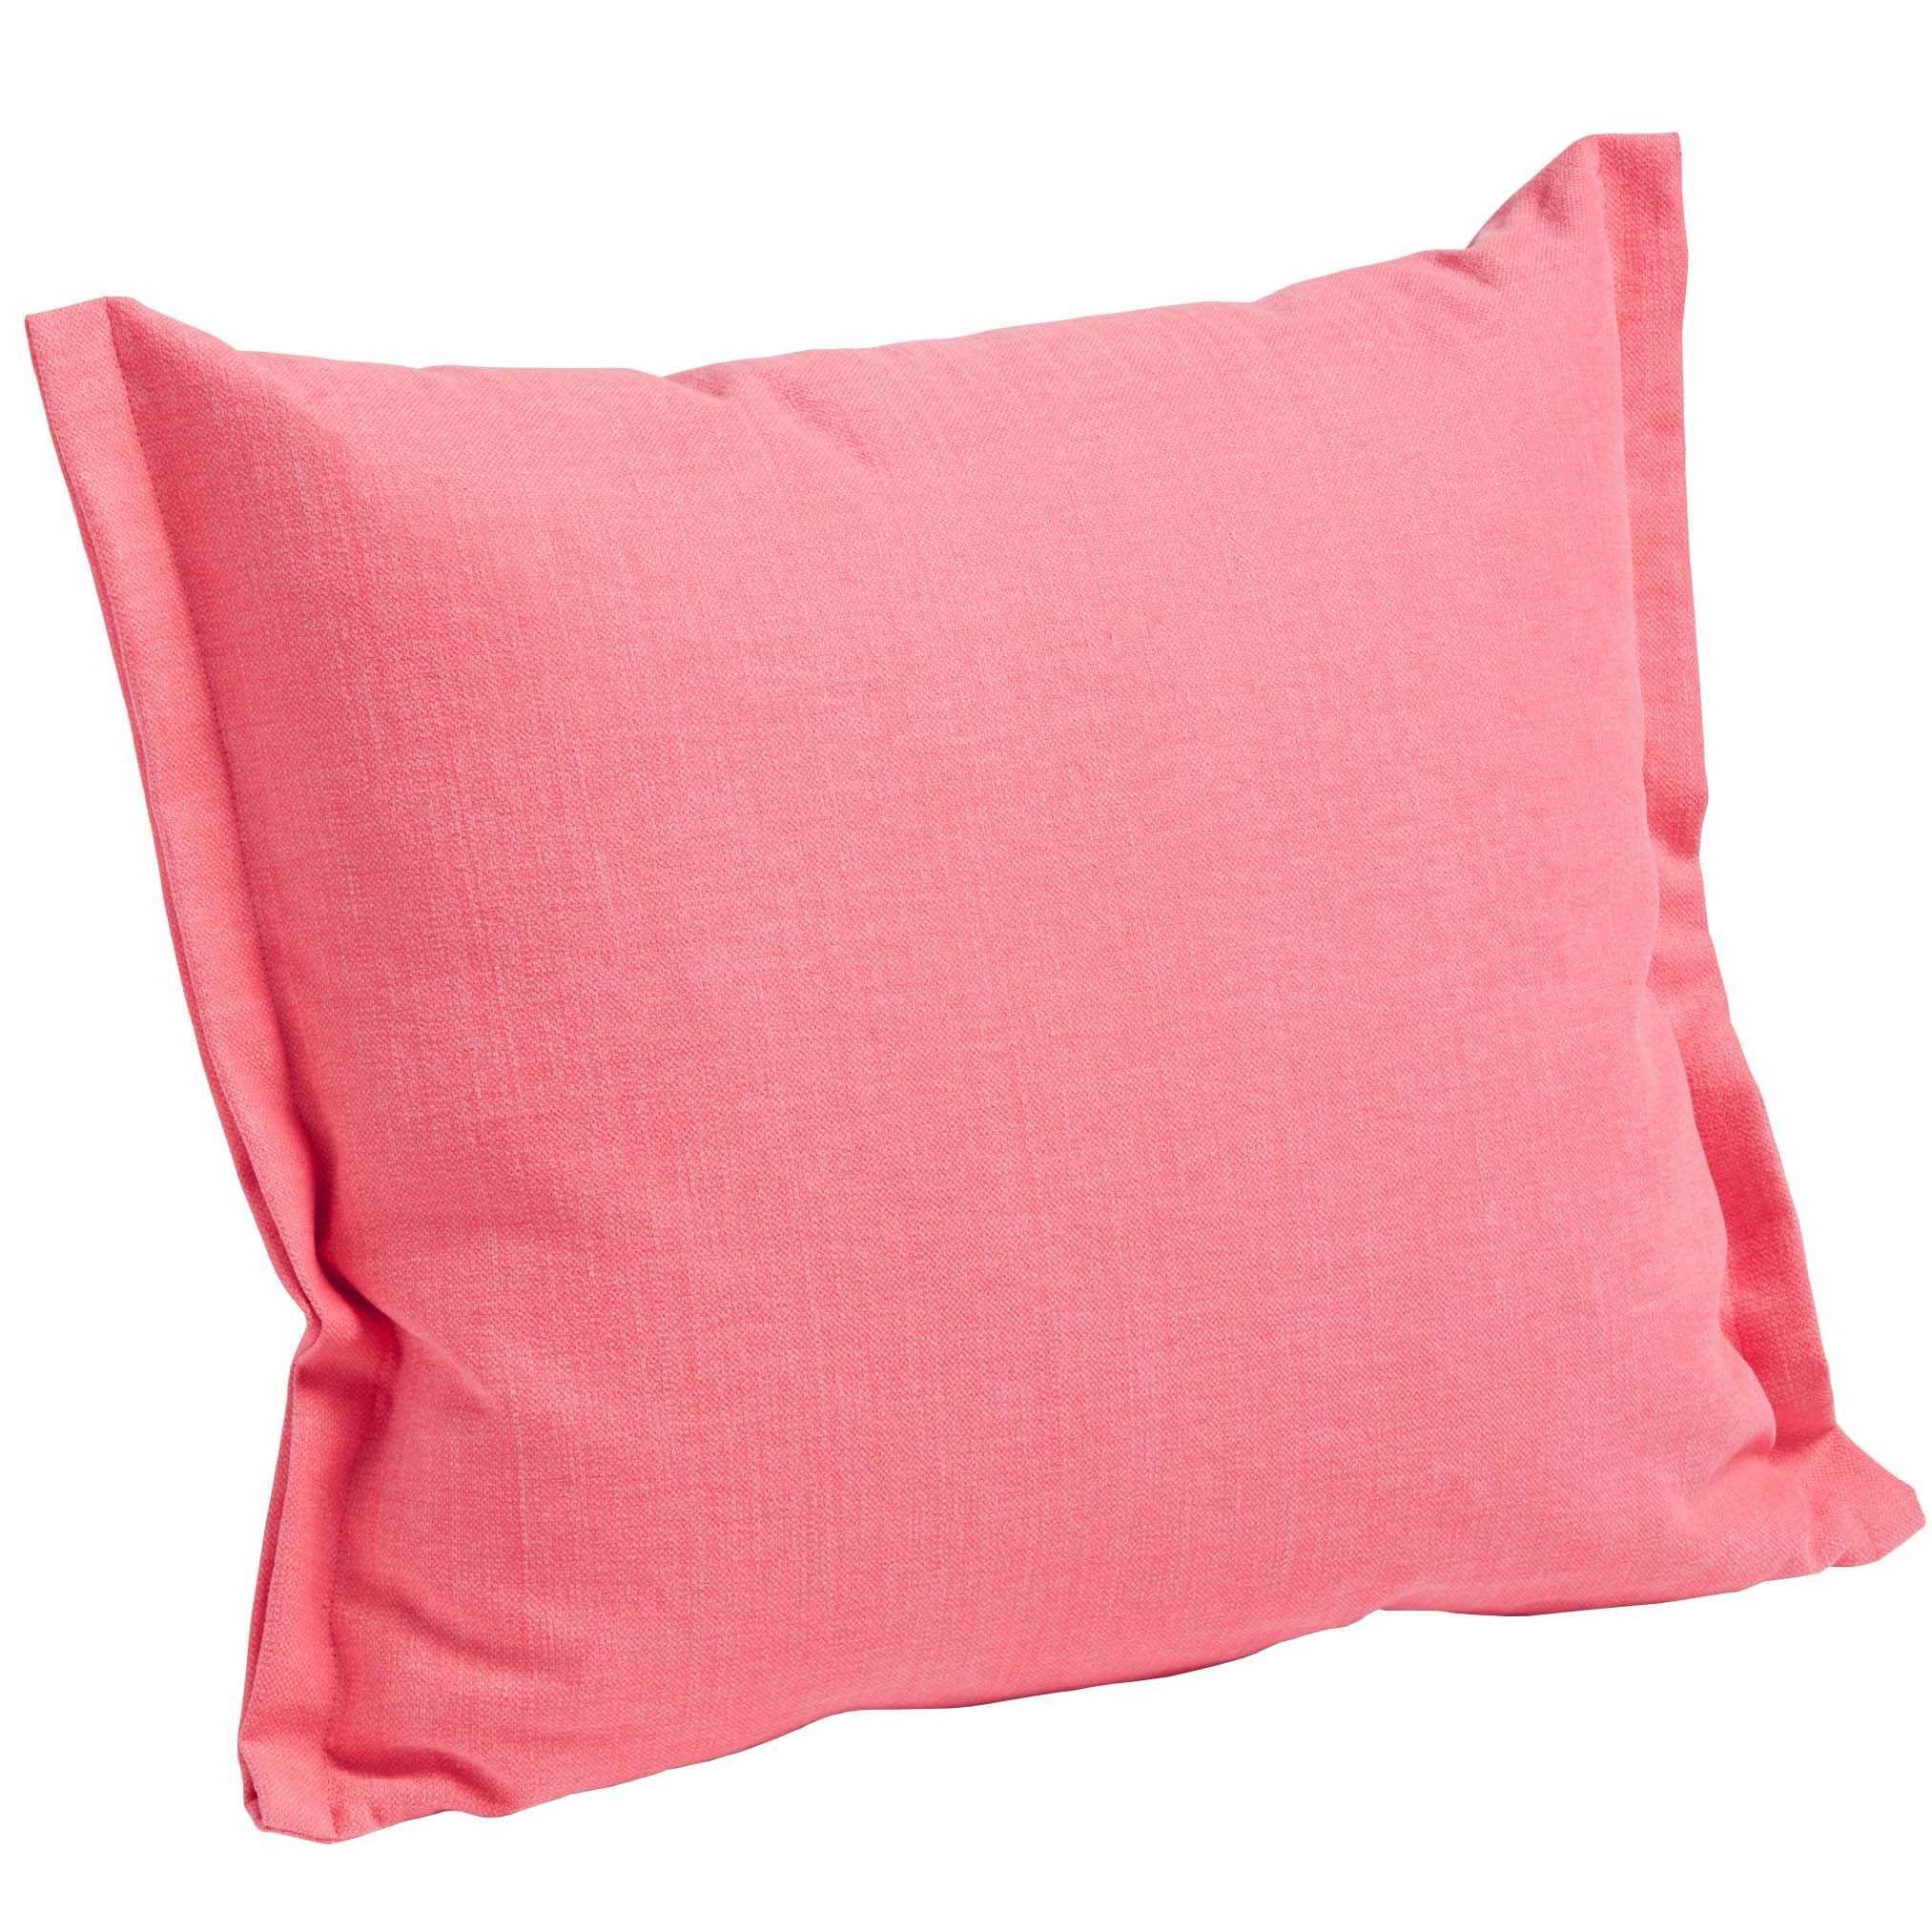 Hay Plica tint kussen flamingo